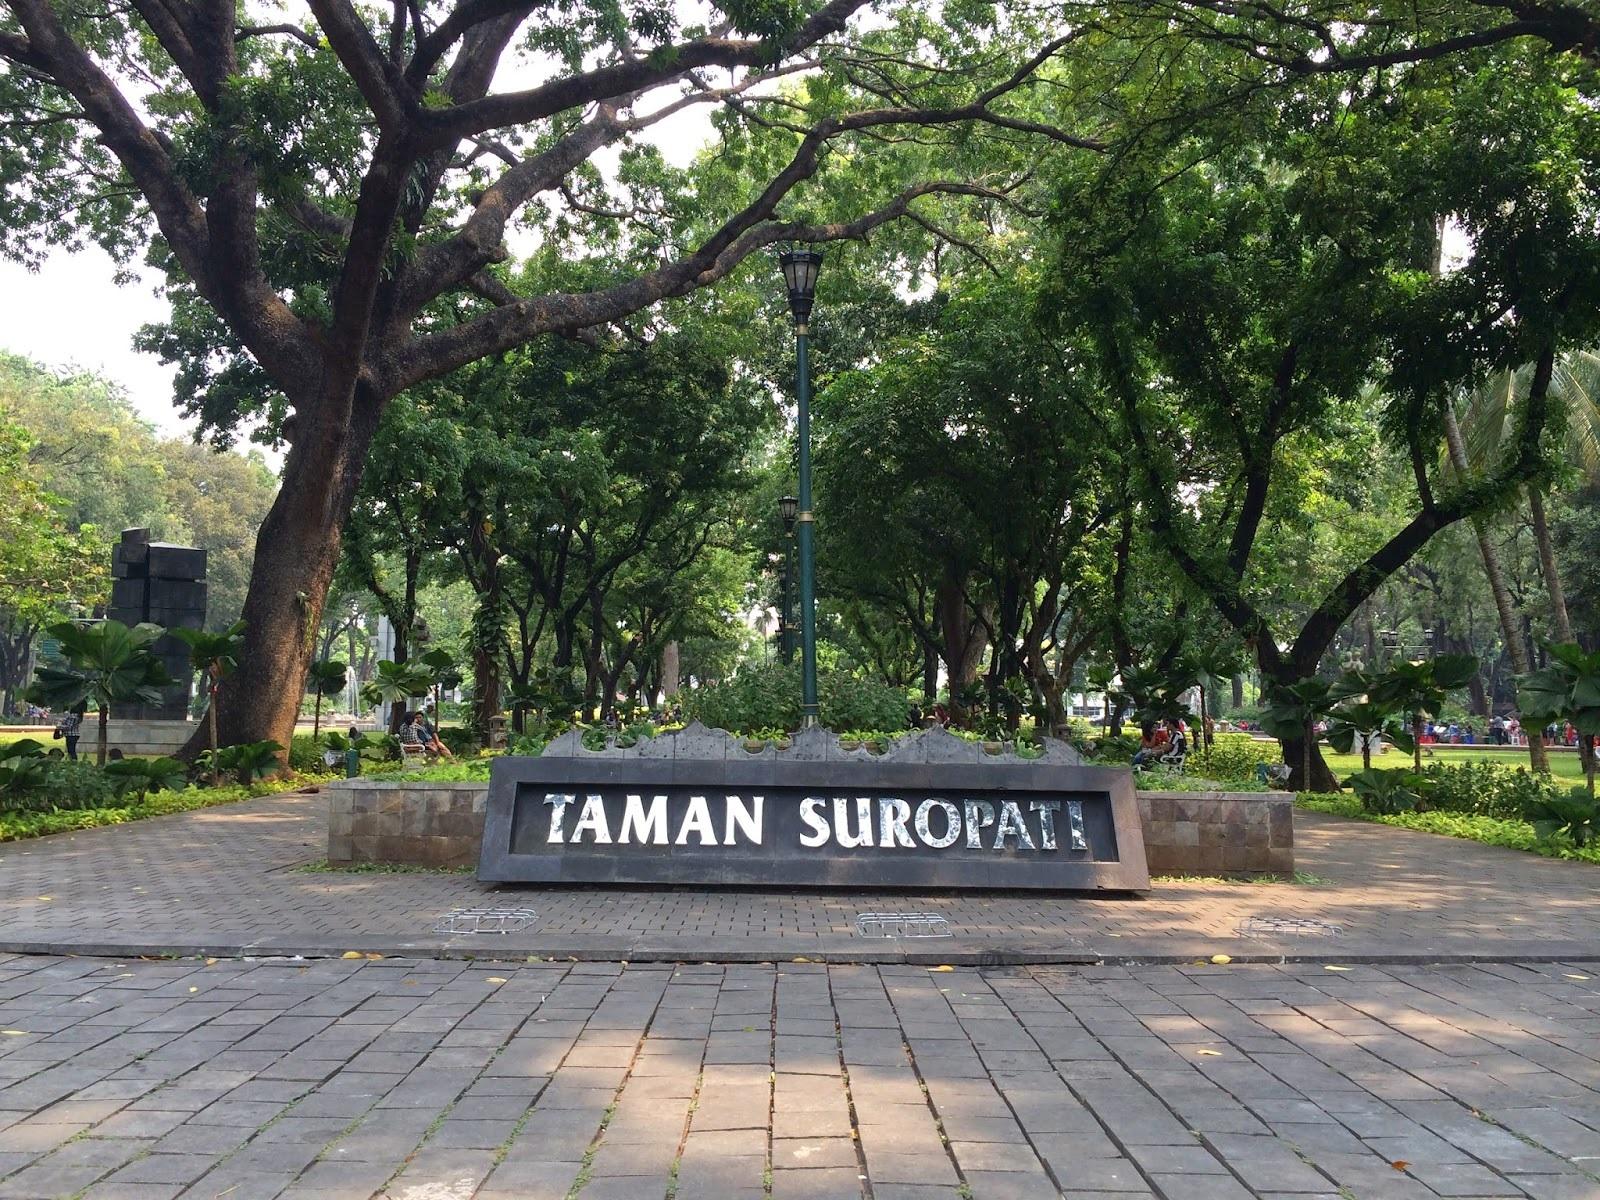 Taman Suropati, Objek Wisata Nan Asri di Tengah Ibukota Jakarta!